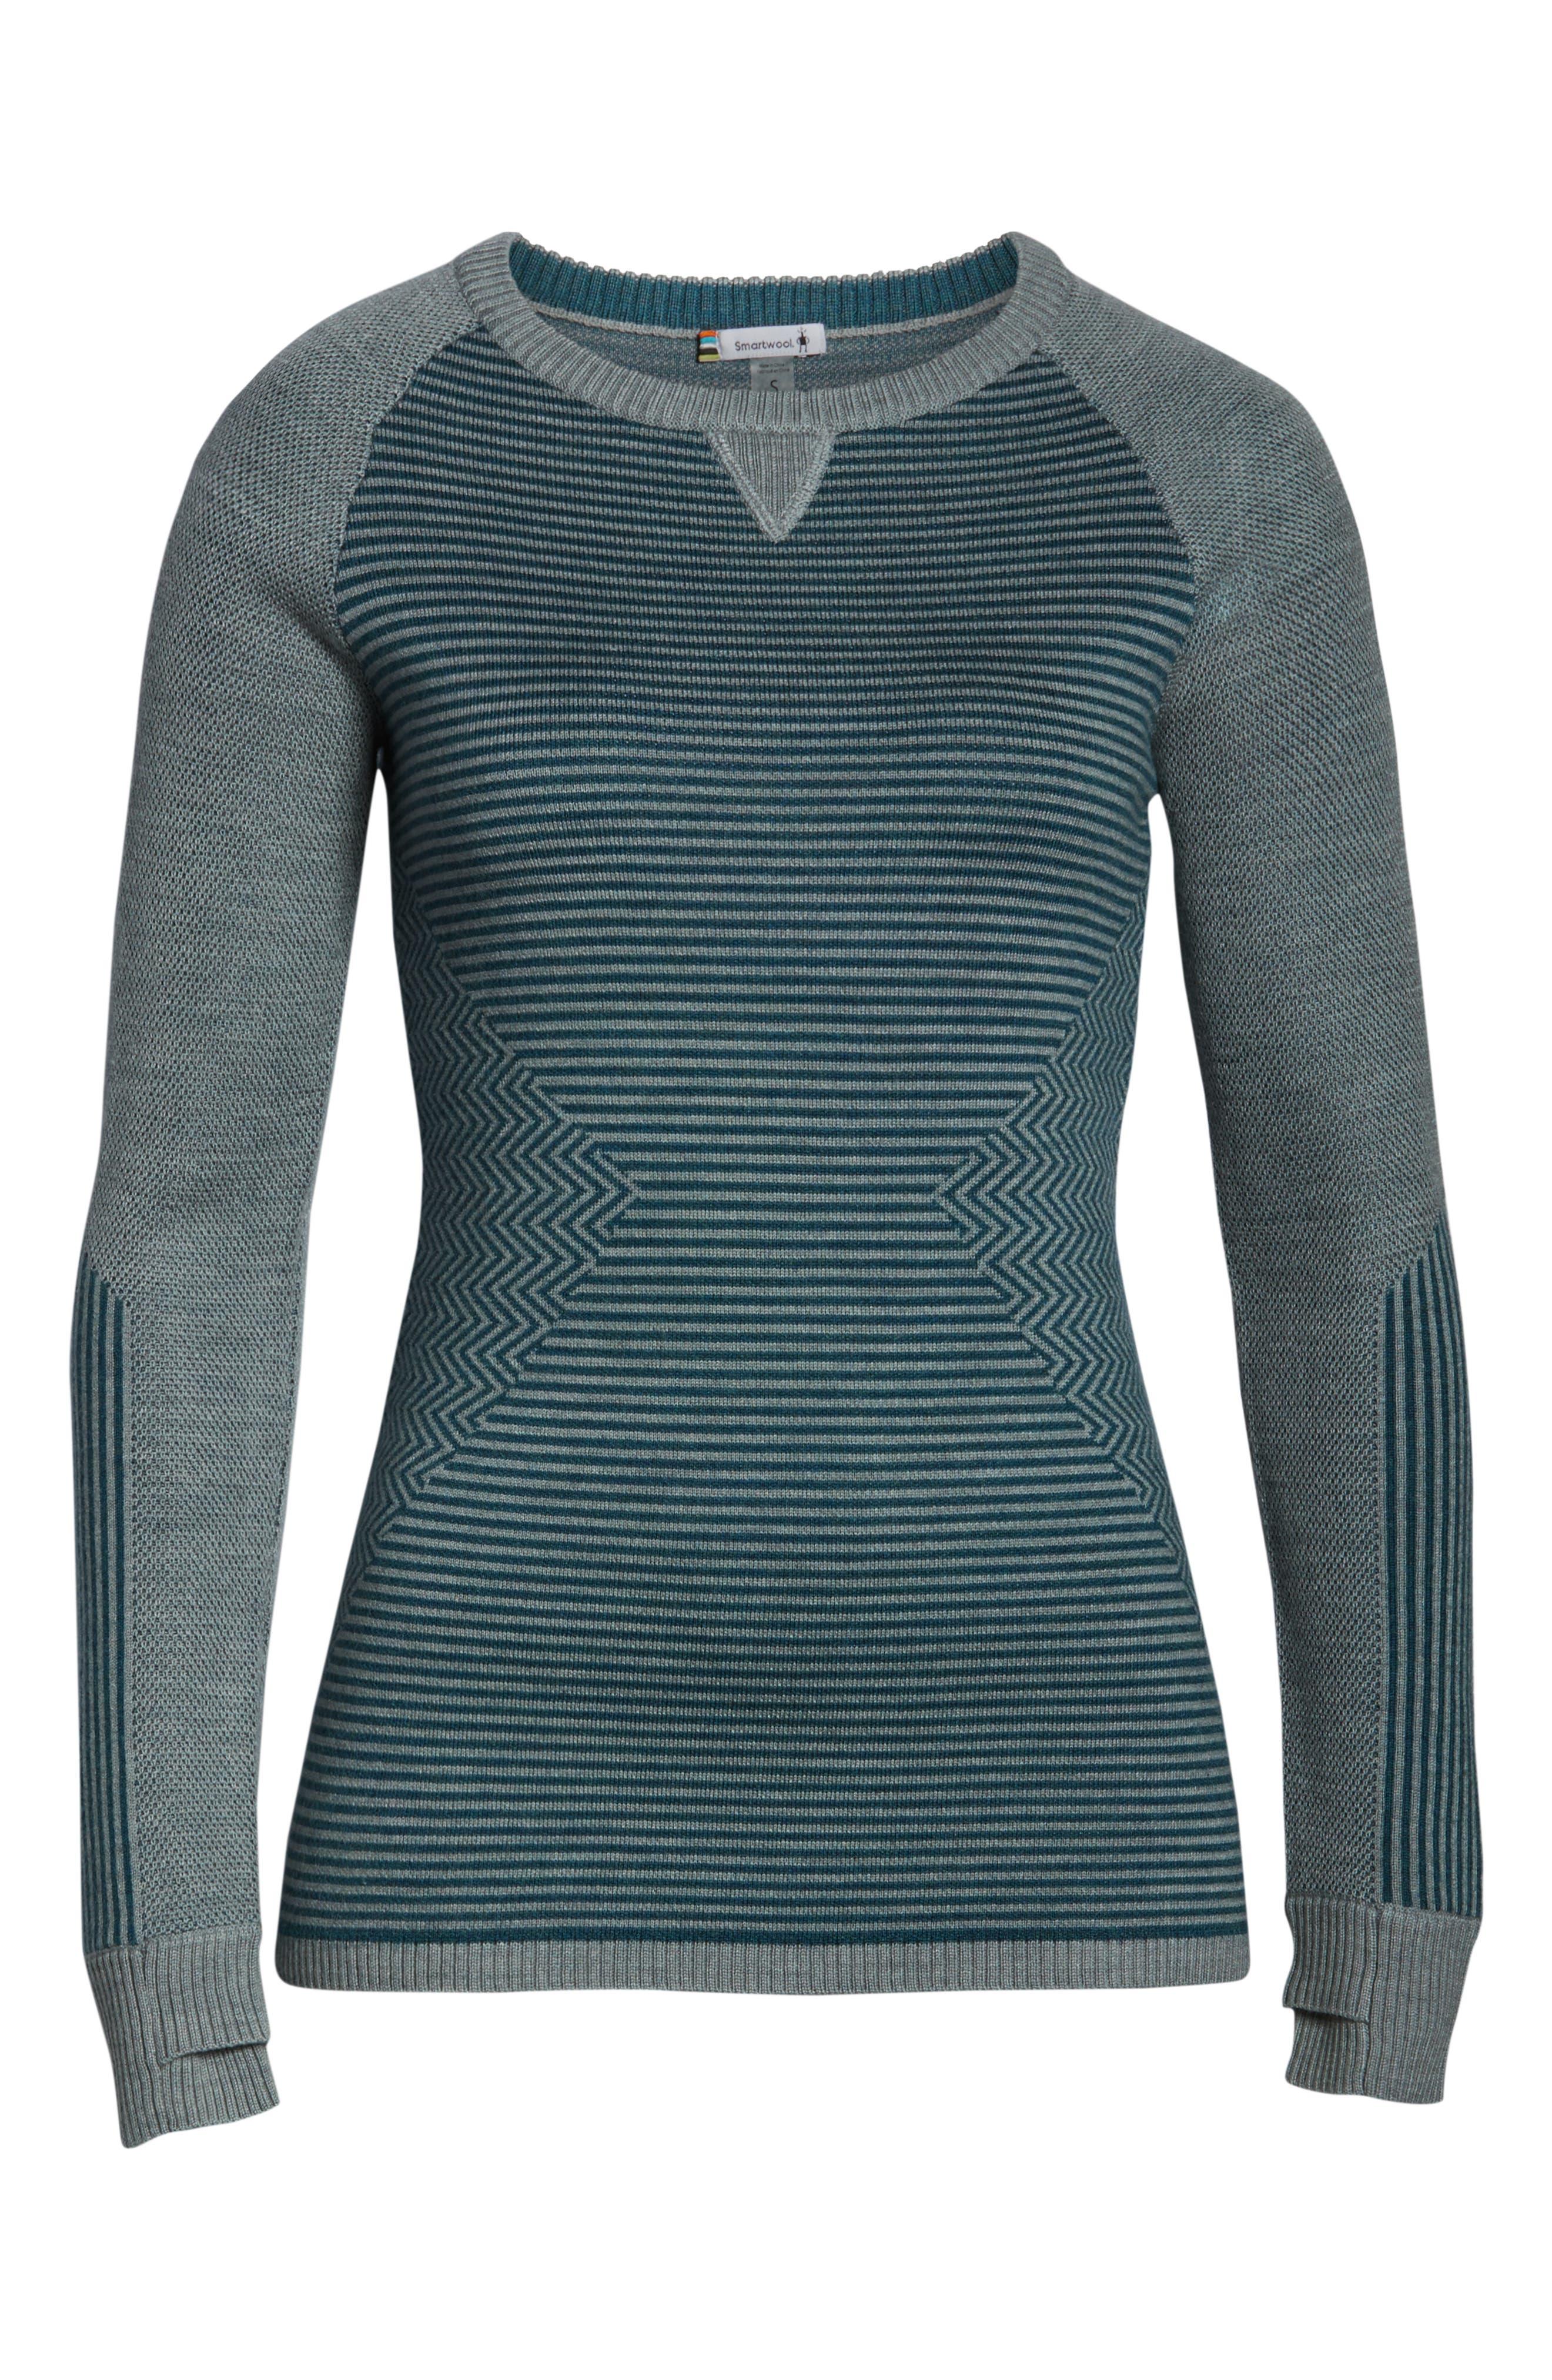 SMARTWOOL,                             Dacono Ski Sweater,                             Alternate thumbnail 7, color,                             310